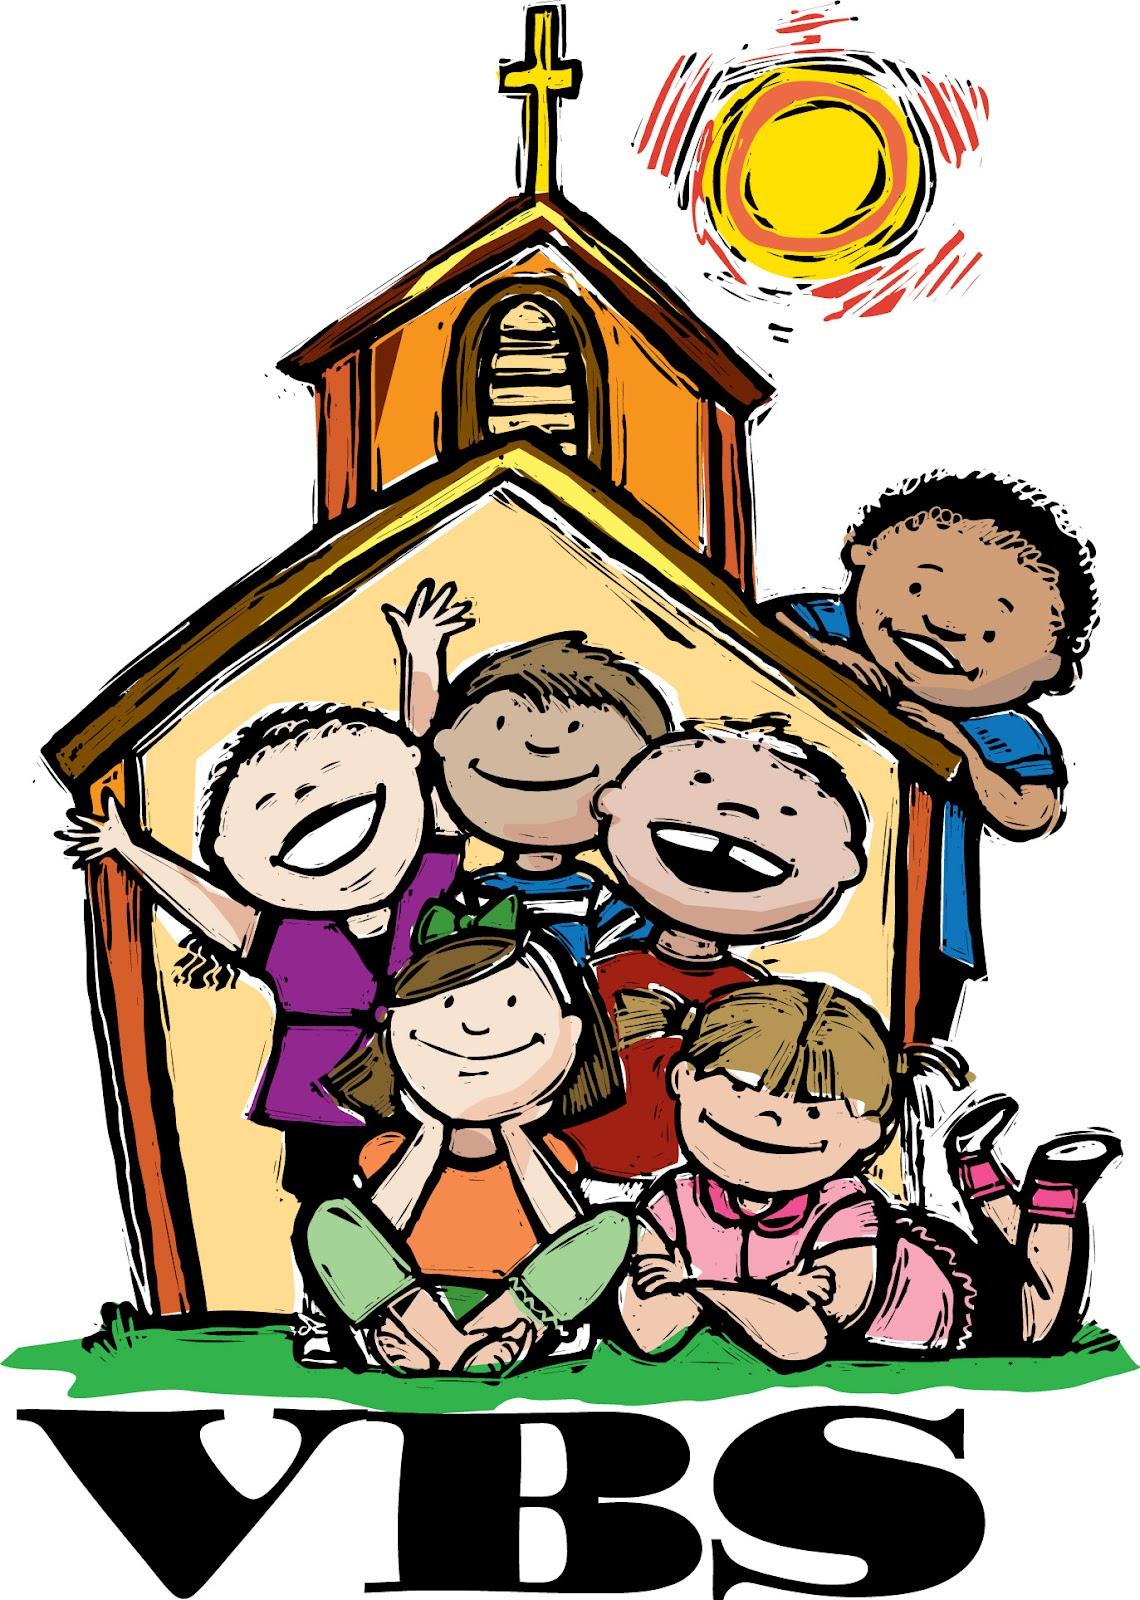 Free Church Vacation Bible School Clip Art free image.